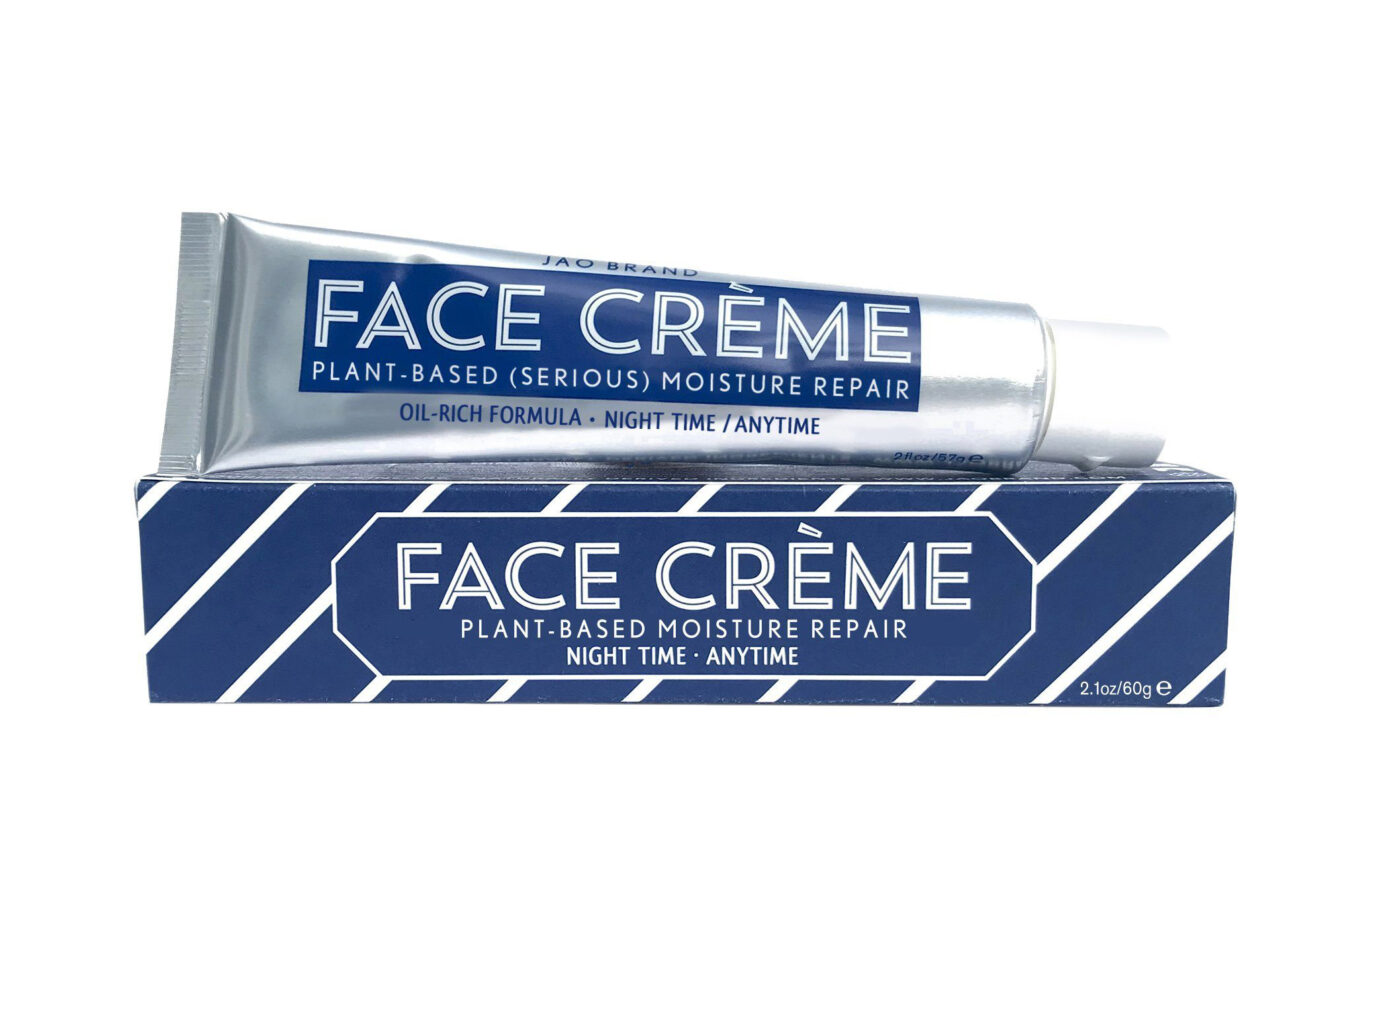 Jao Face Crème